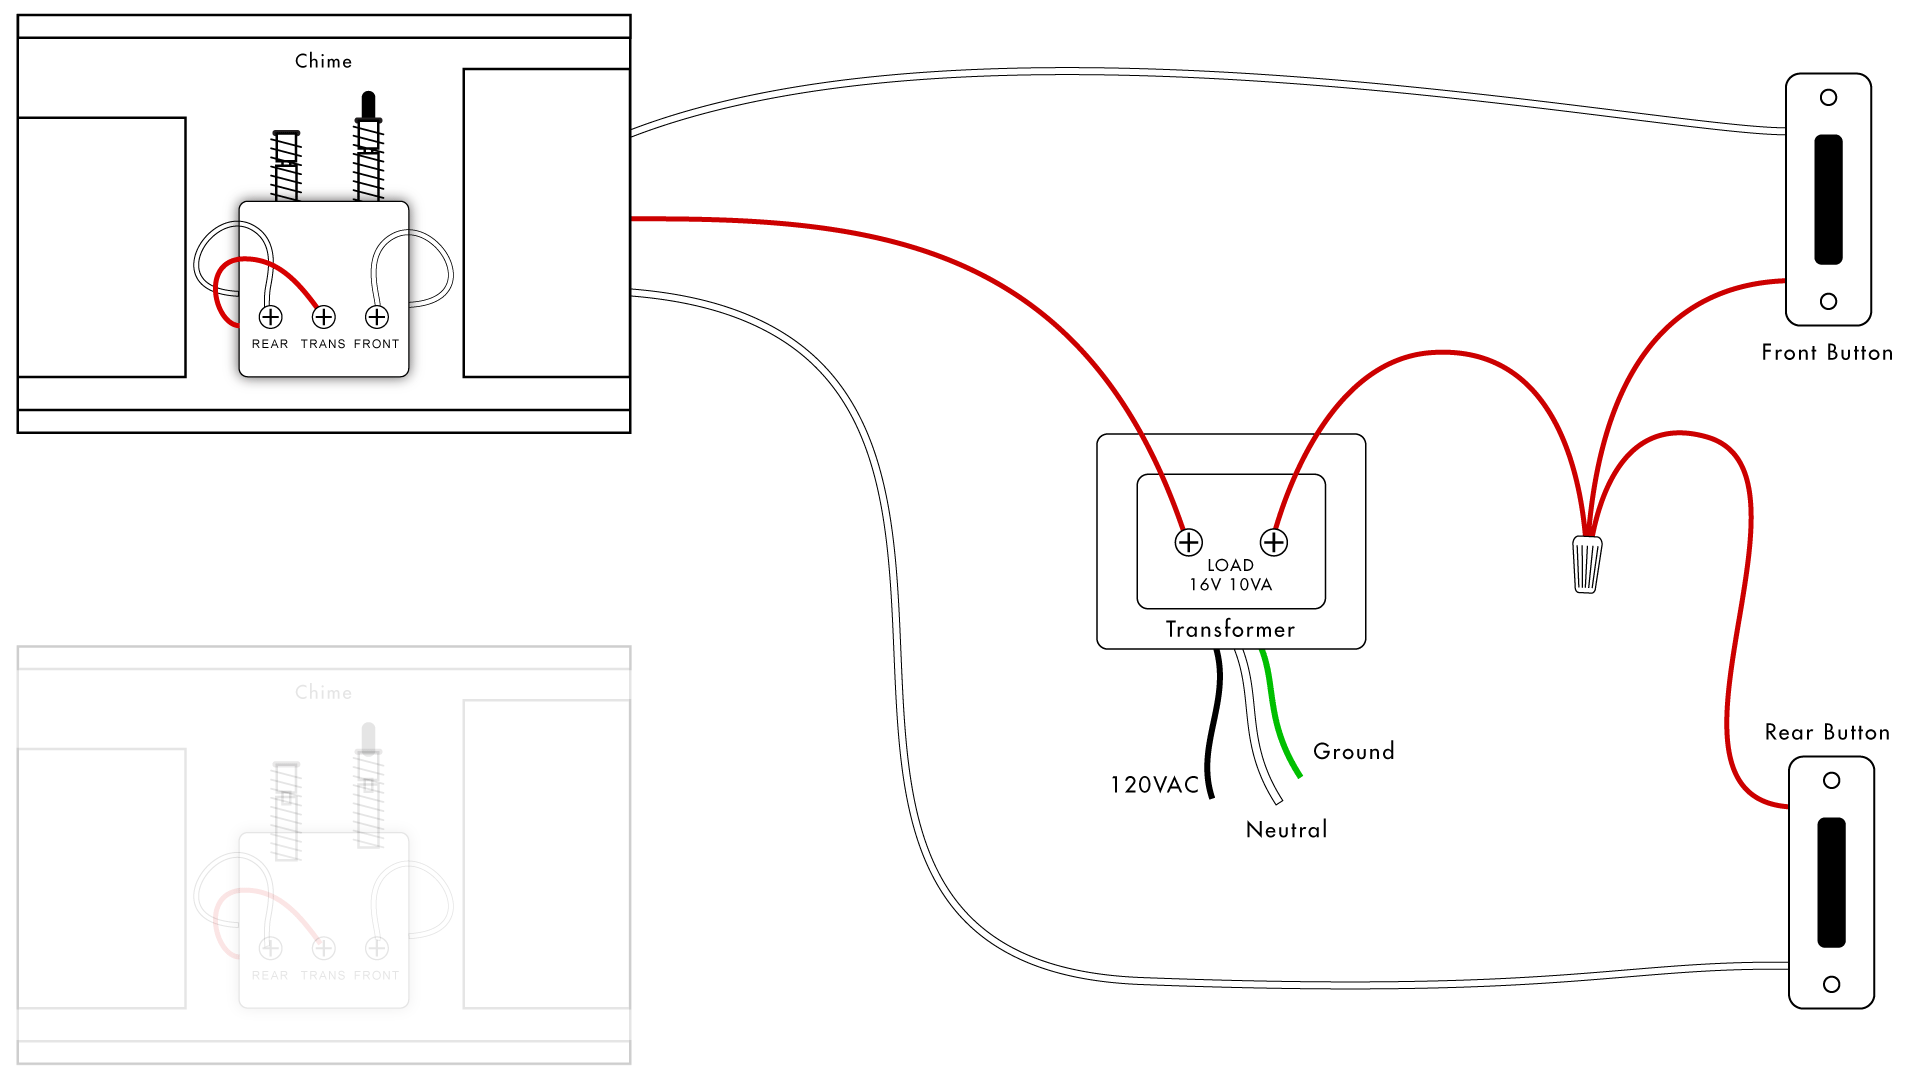 hight resolution of new wiring diagram for bt master socket diagrams digramssample diagramimages wiringdiagramsample wiringdiagram